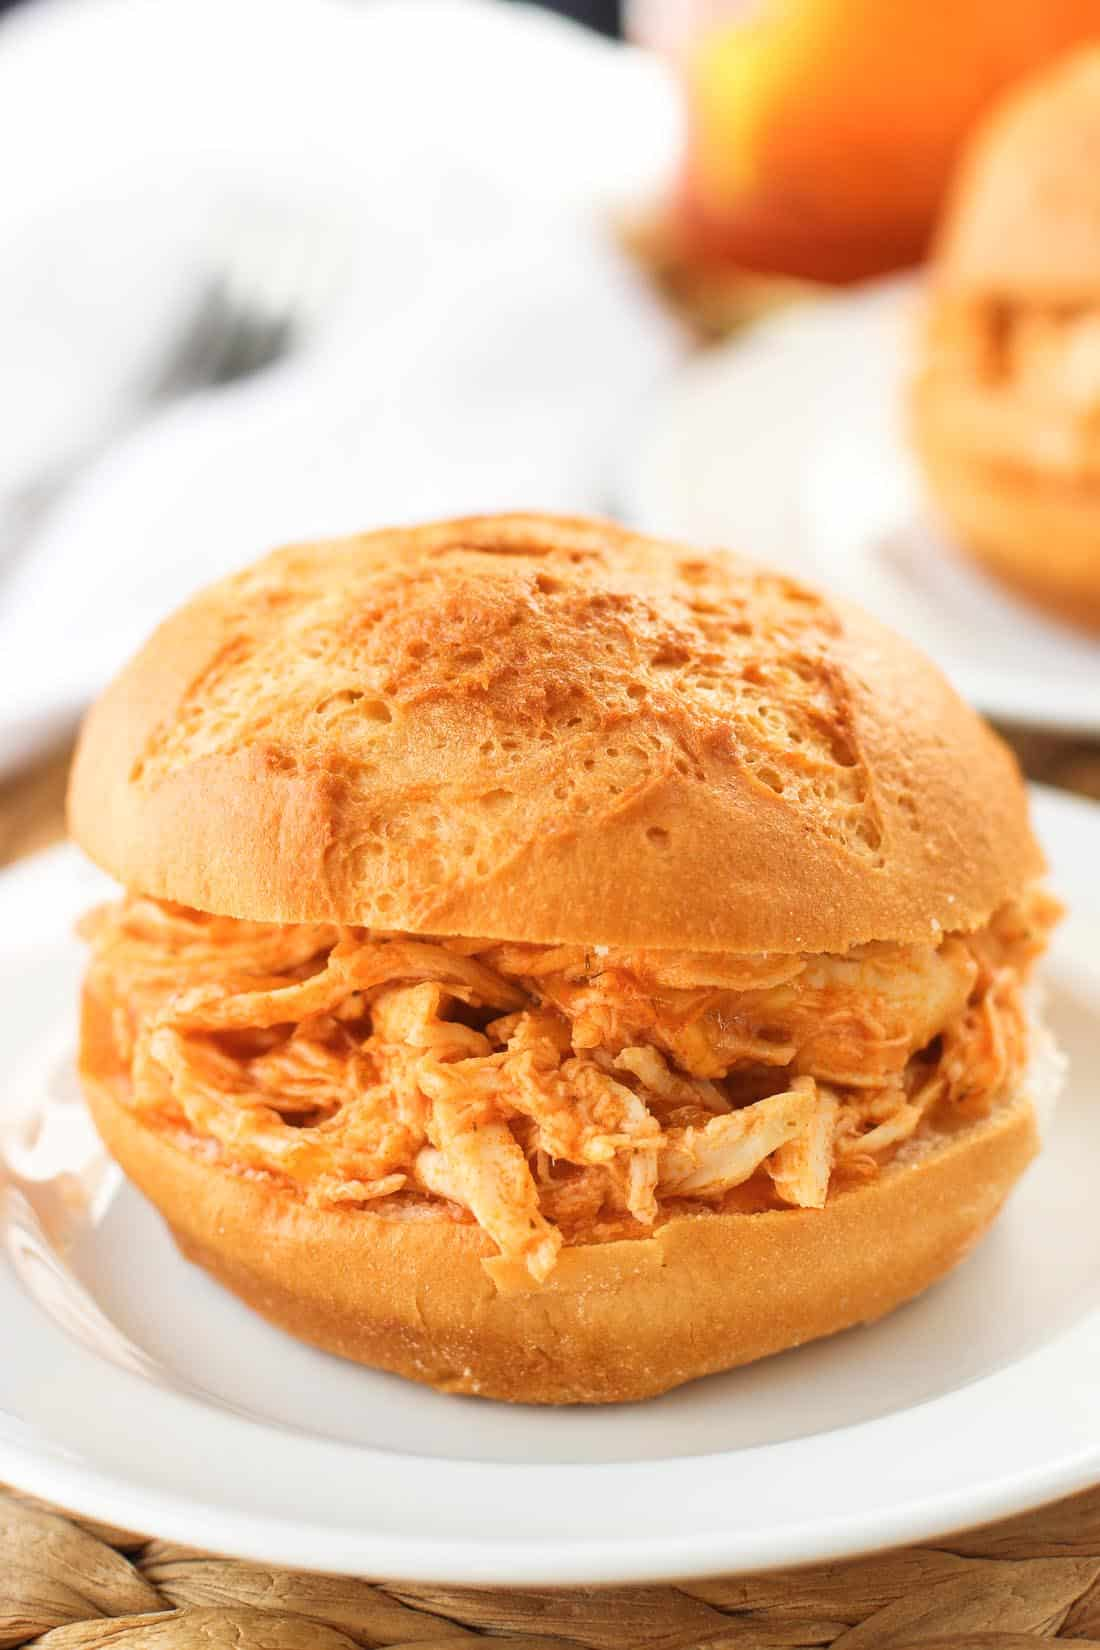 A buffalo chicken sandwich on a round roll.